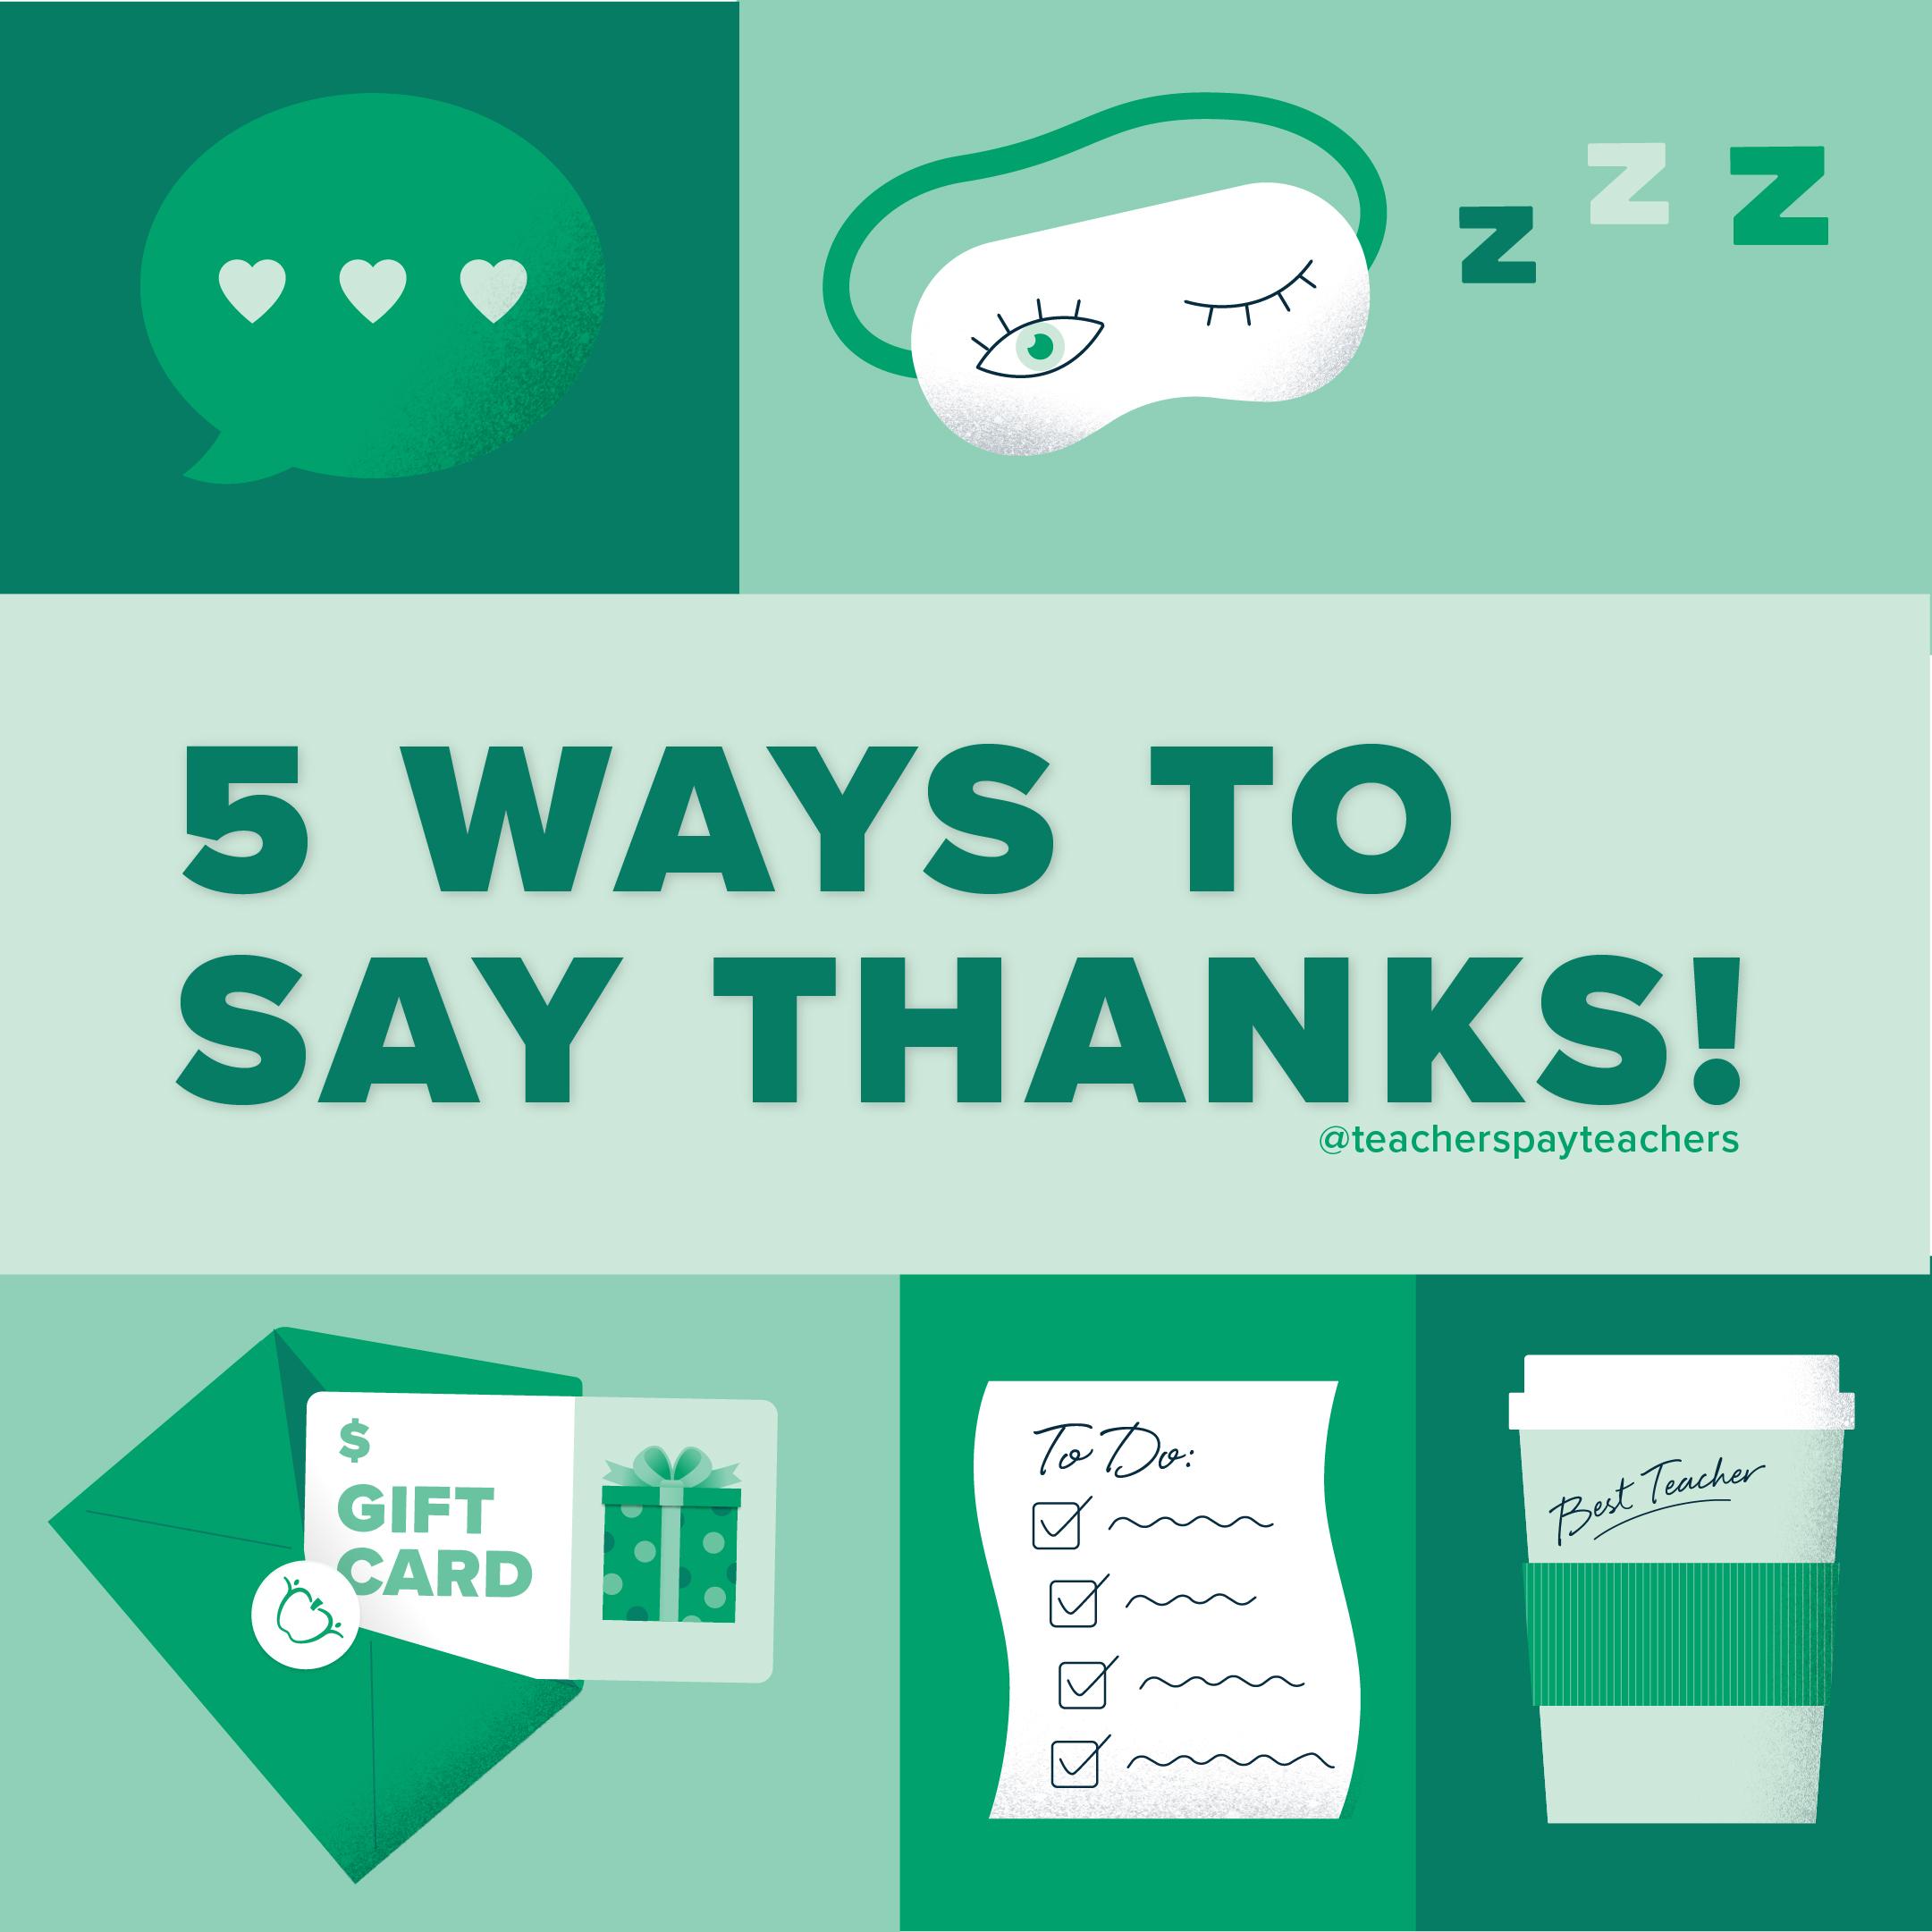 5 Ways to Say Thanks